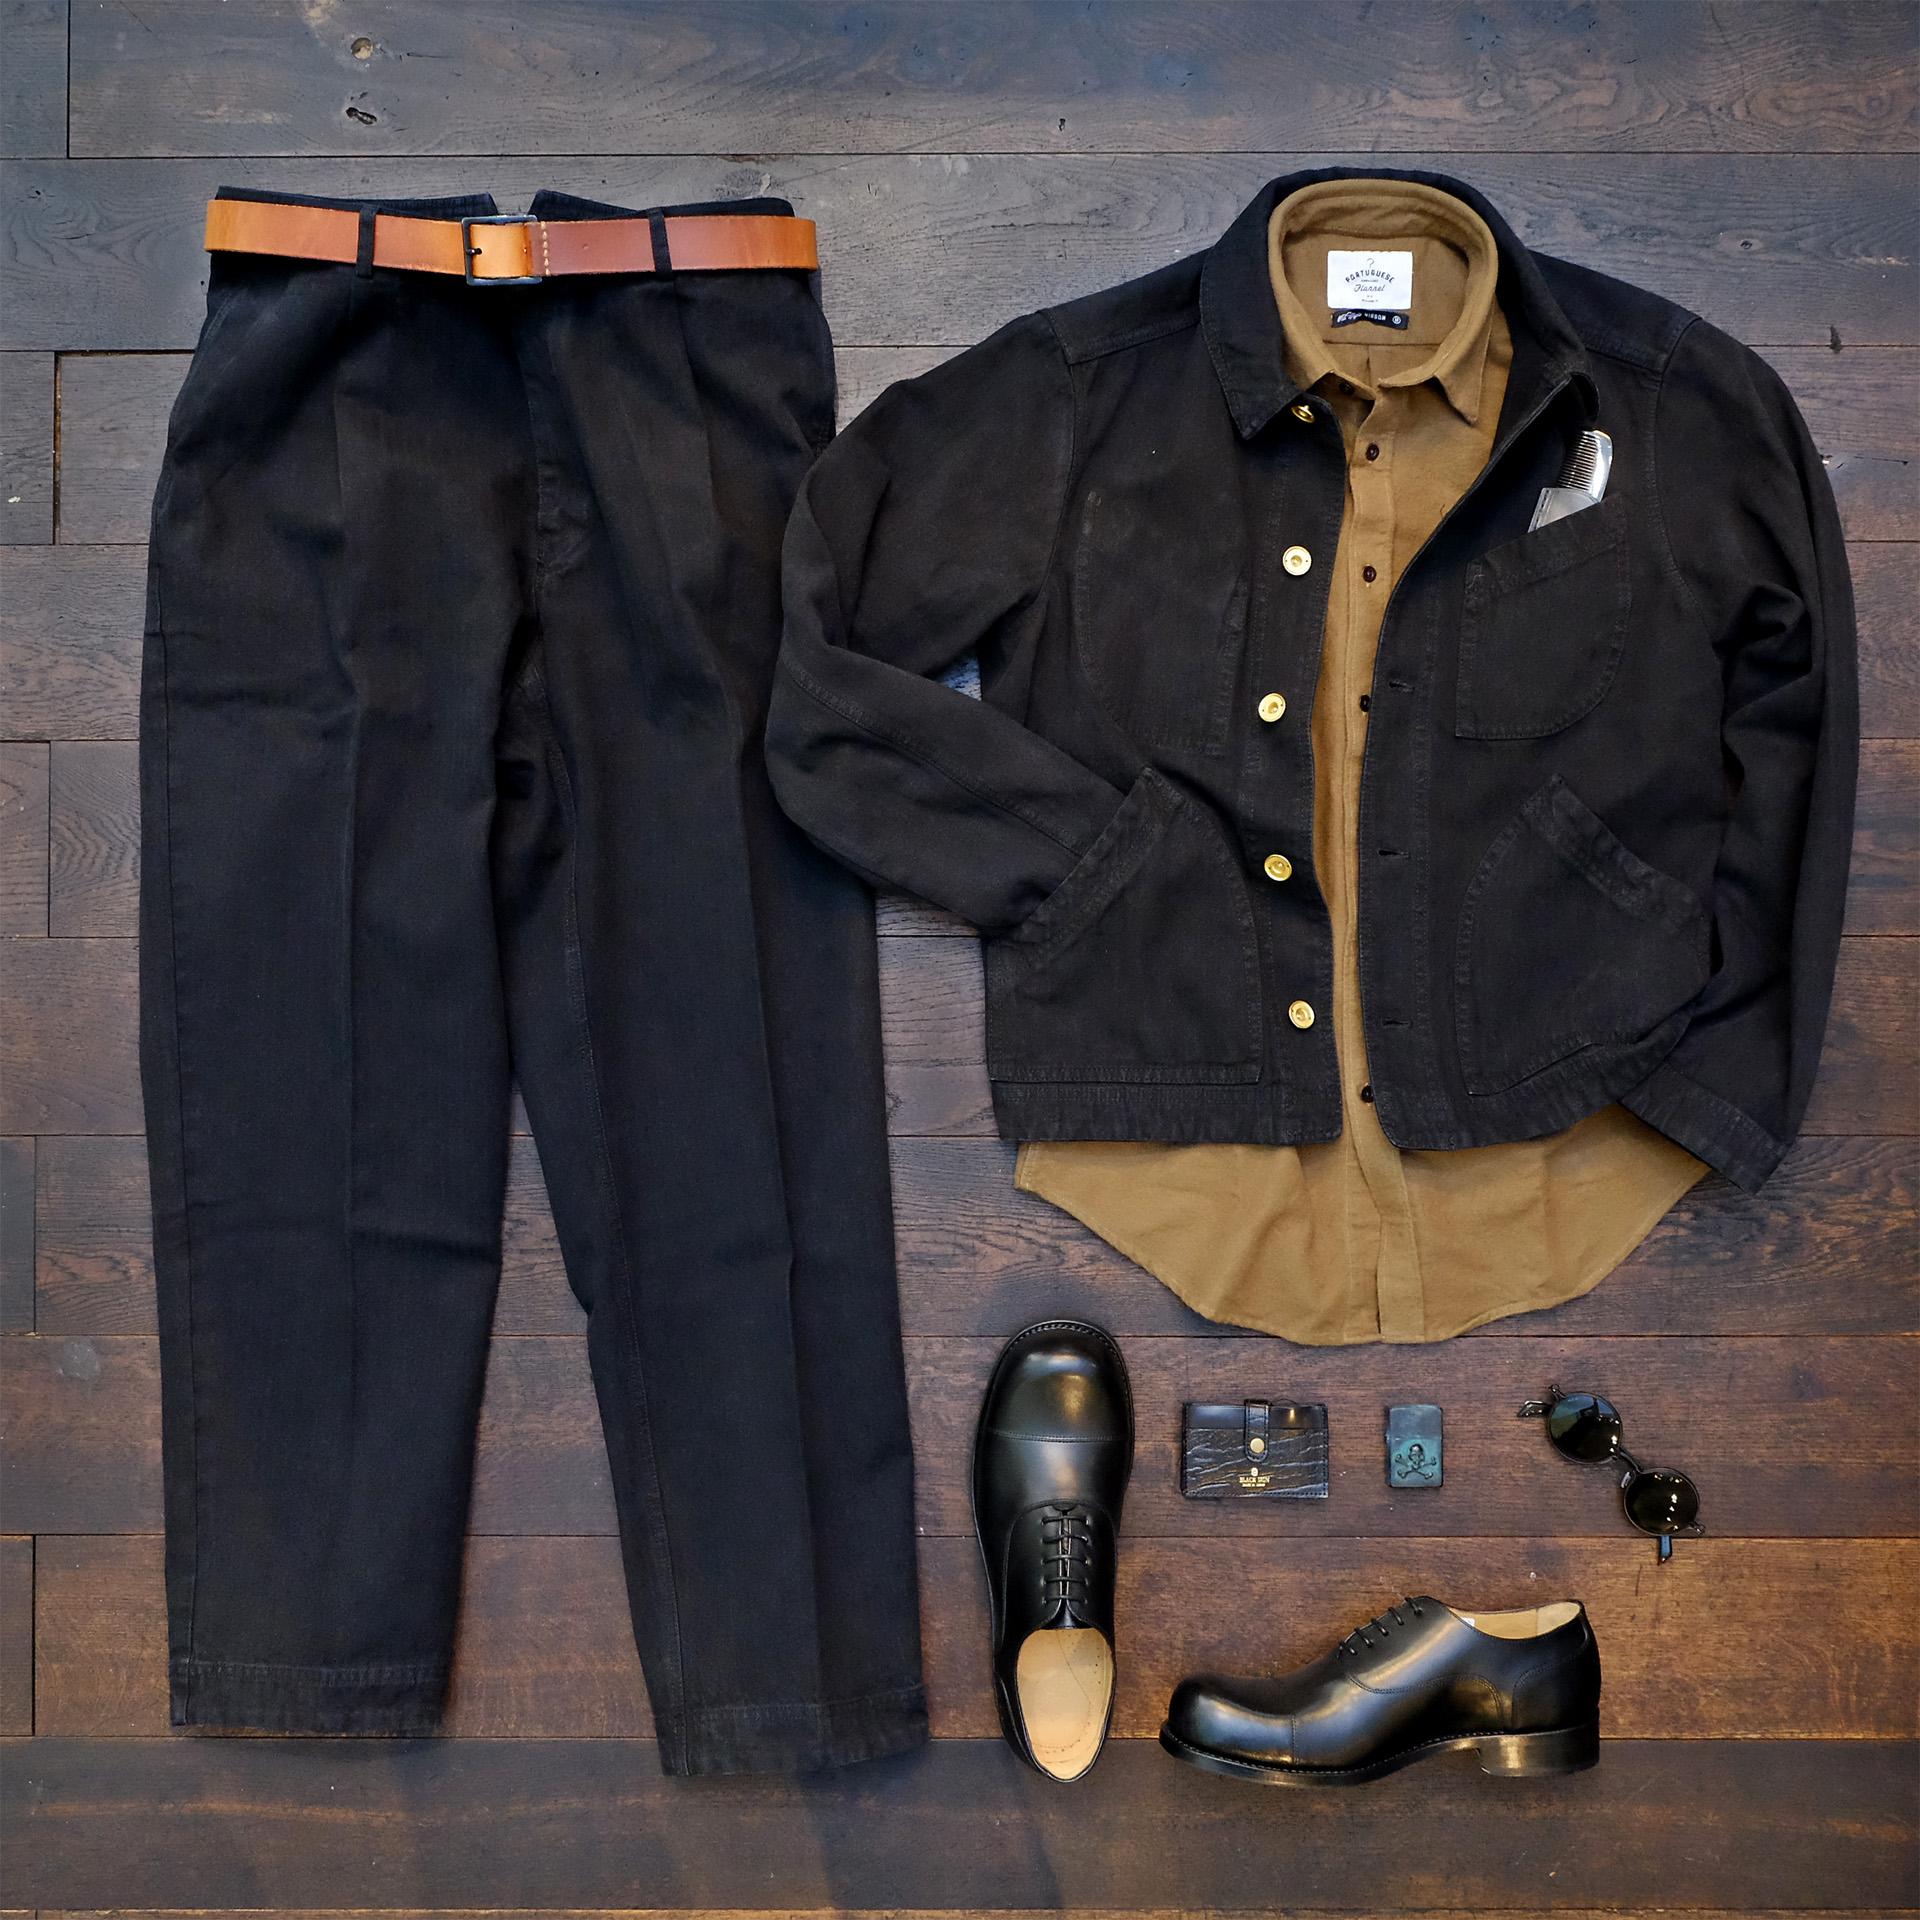 hansen-arbeiter-jacke-hose-schwarz-herringbone-flanellhemd-hobo-shoes-outfitderwoche-blacksign-feinschmuck-tavat